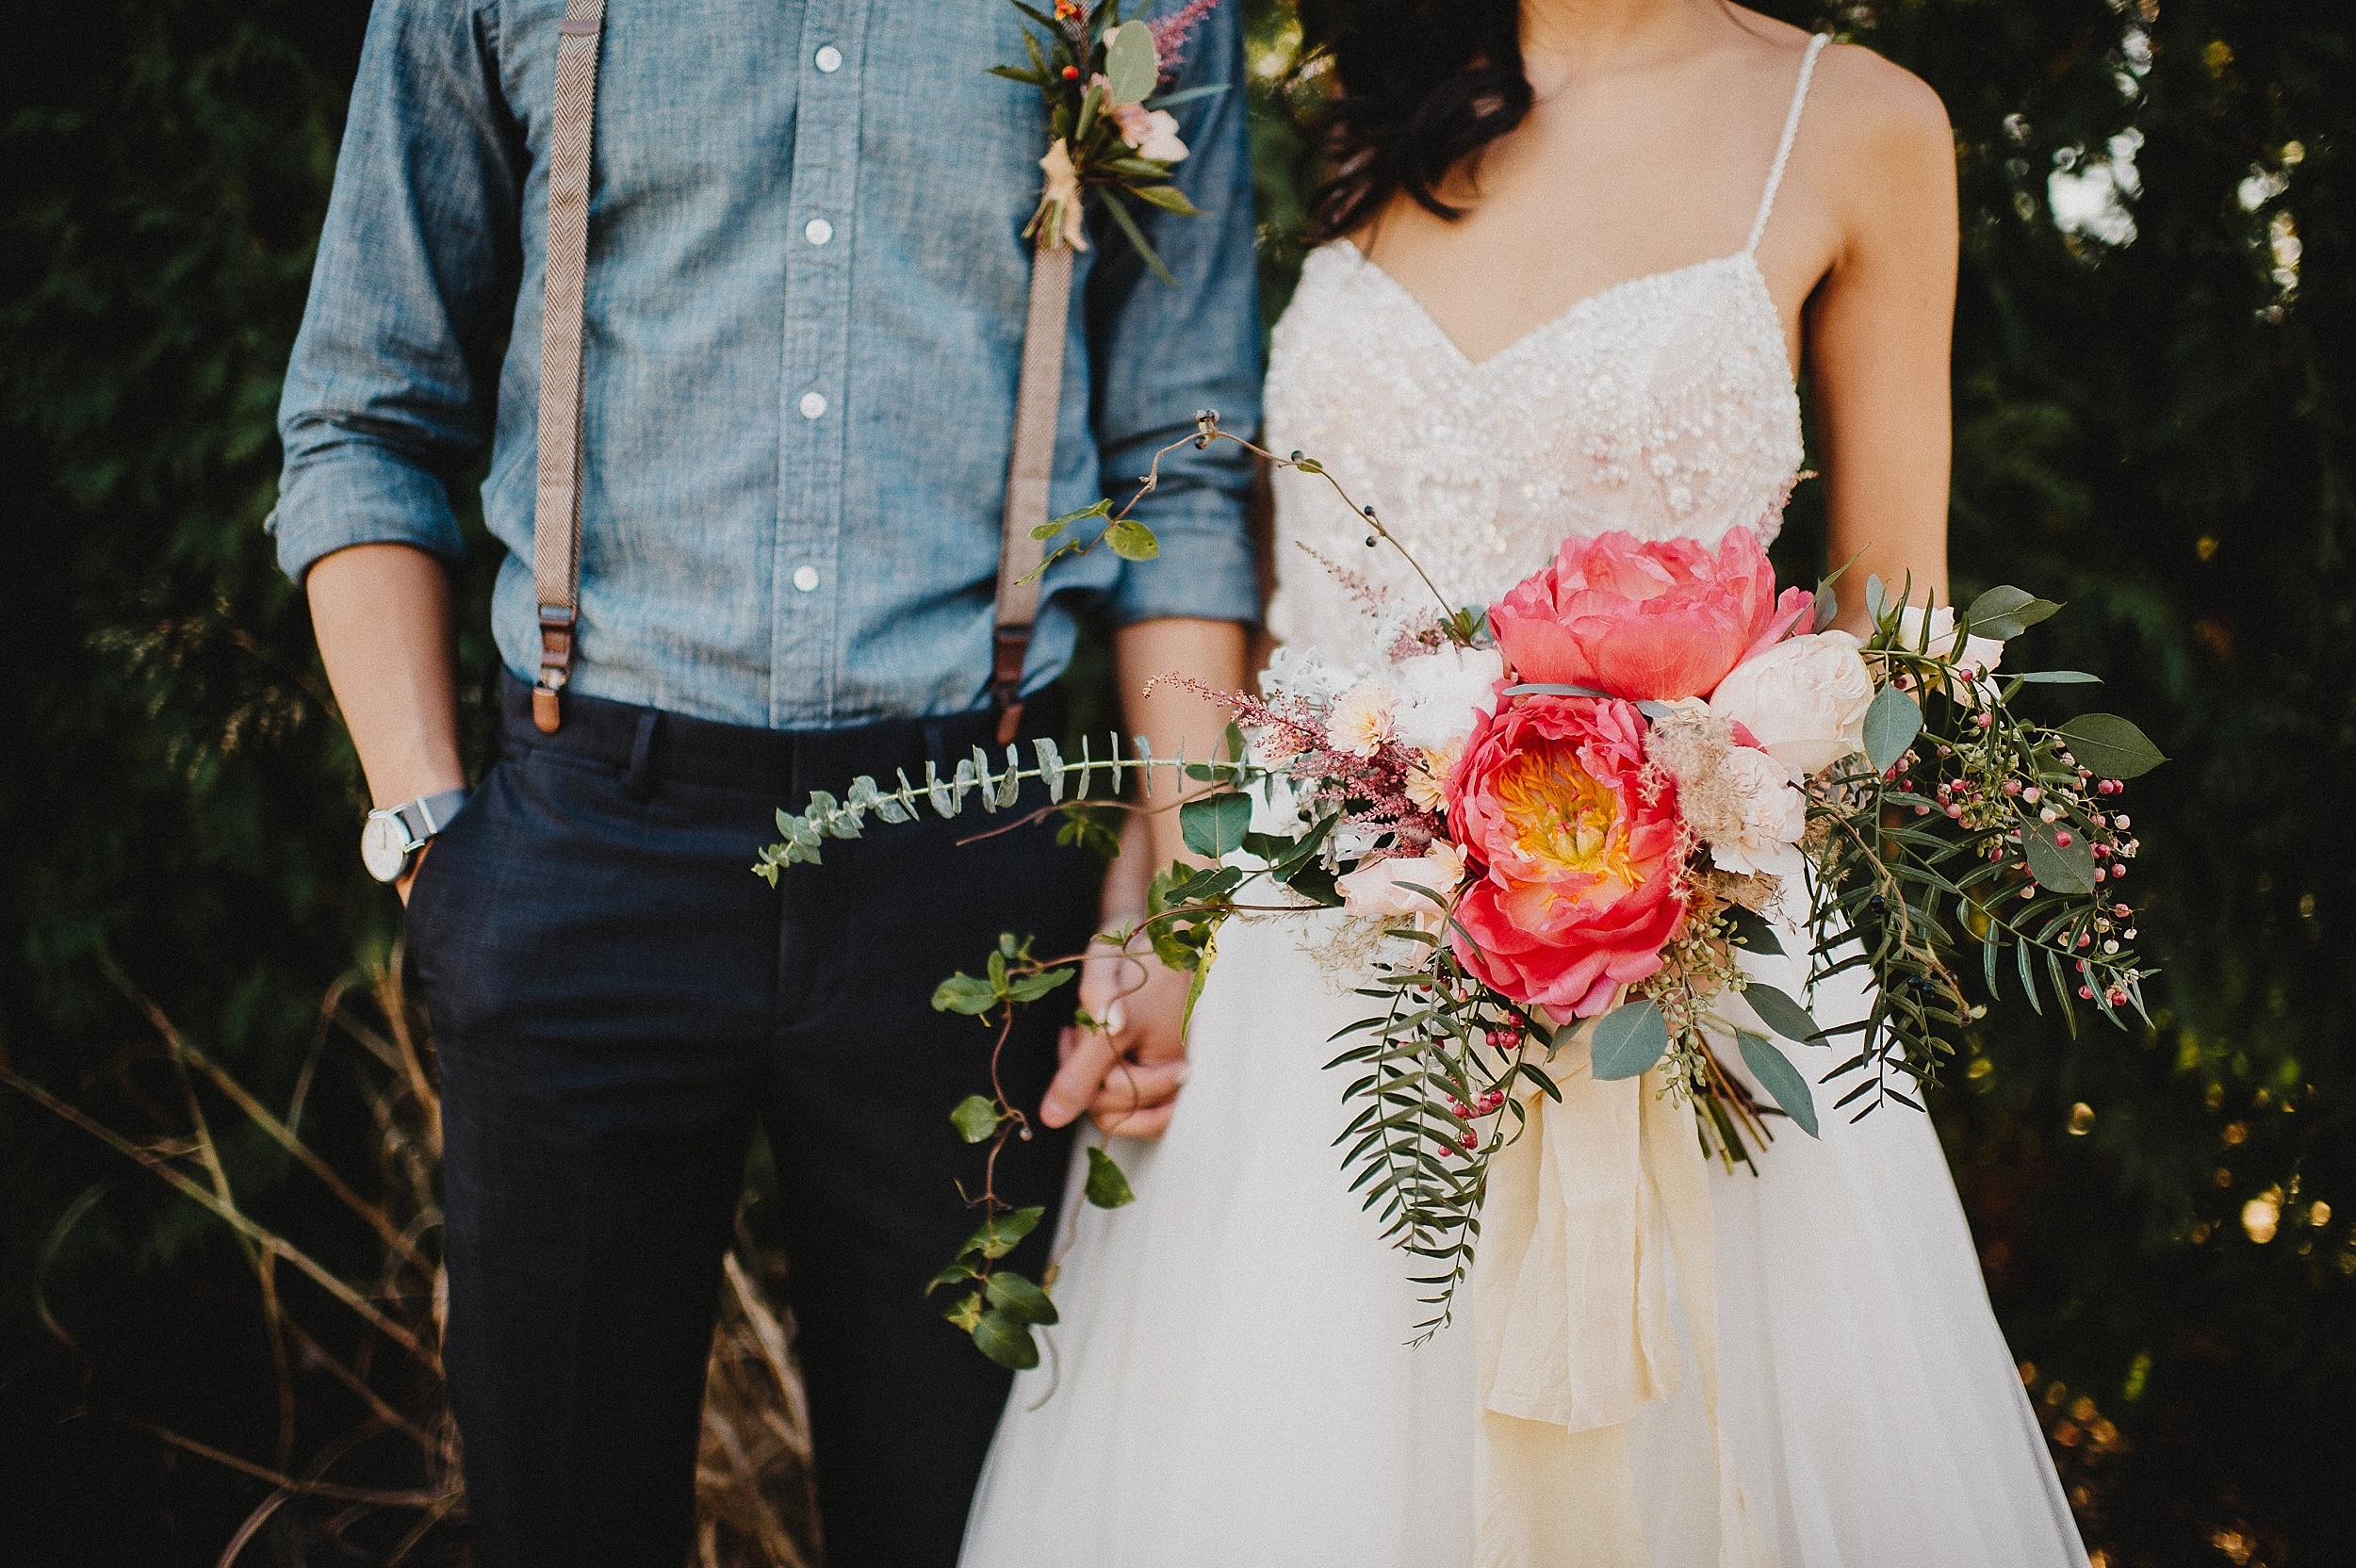 terrain-at-styers-wedding-photography-29.jpg